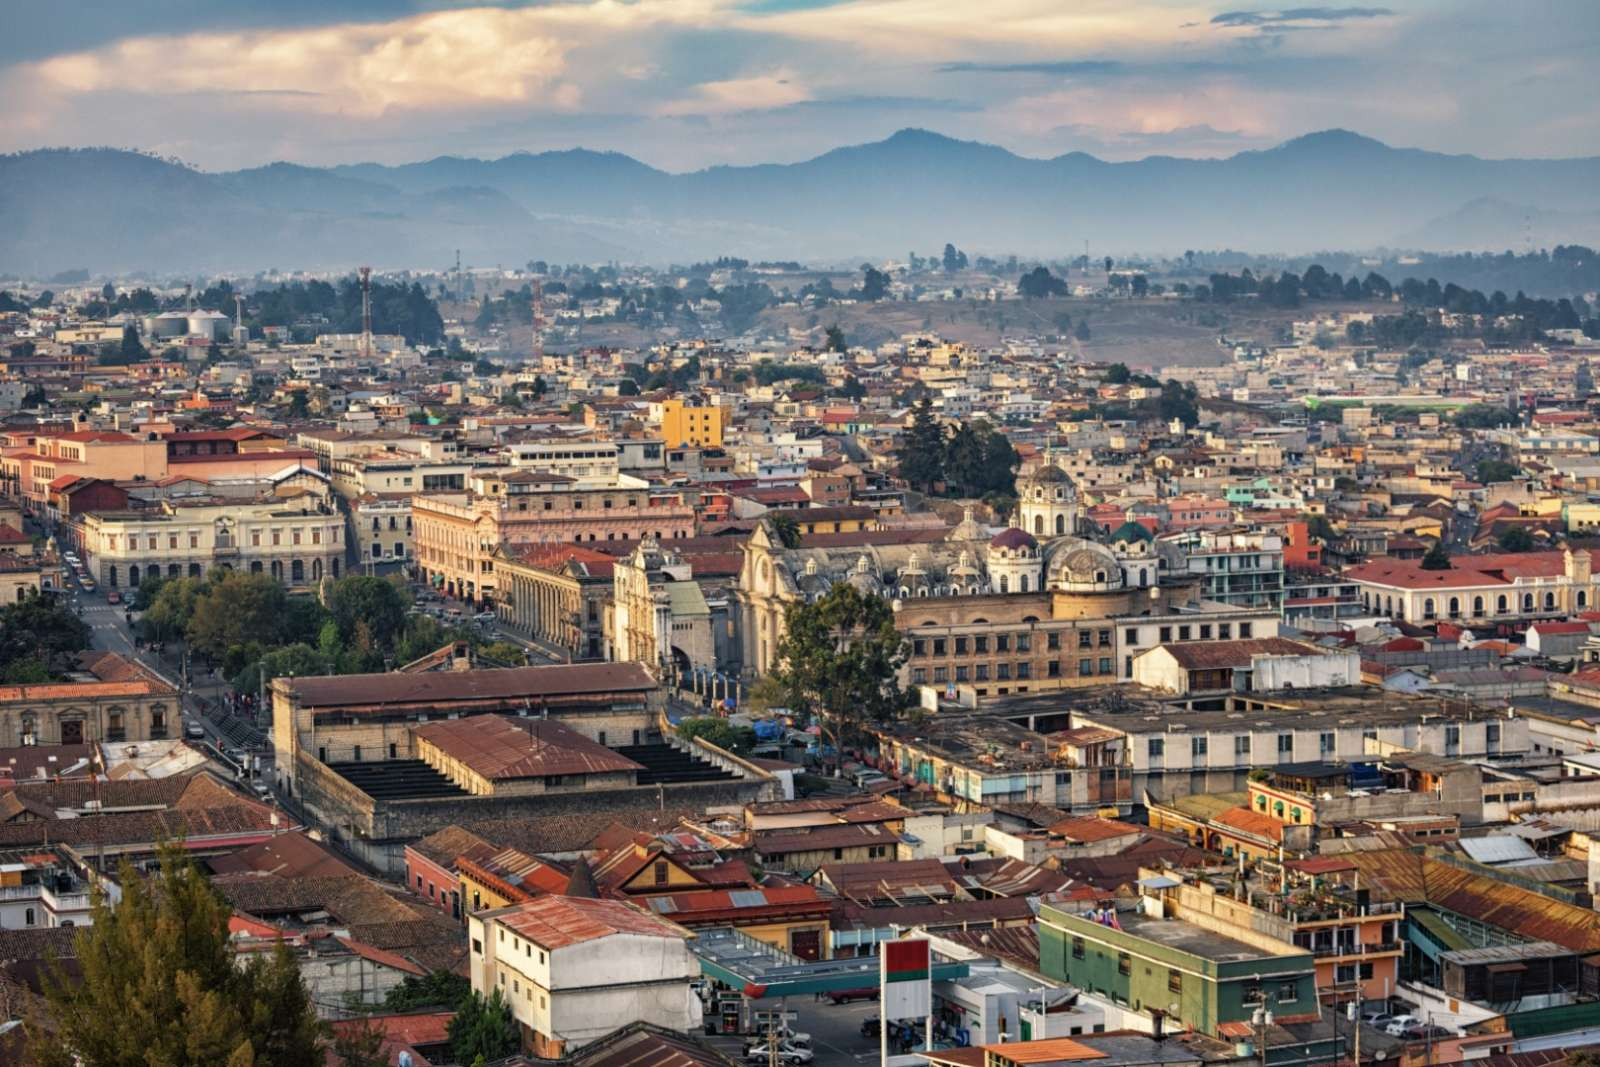 Aerial view of Quetzaltenango, Guatemala